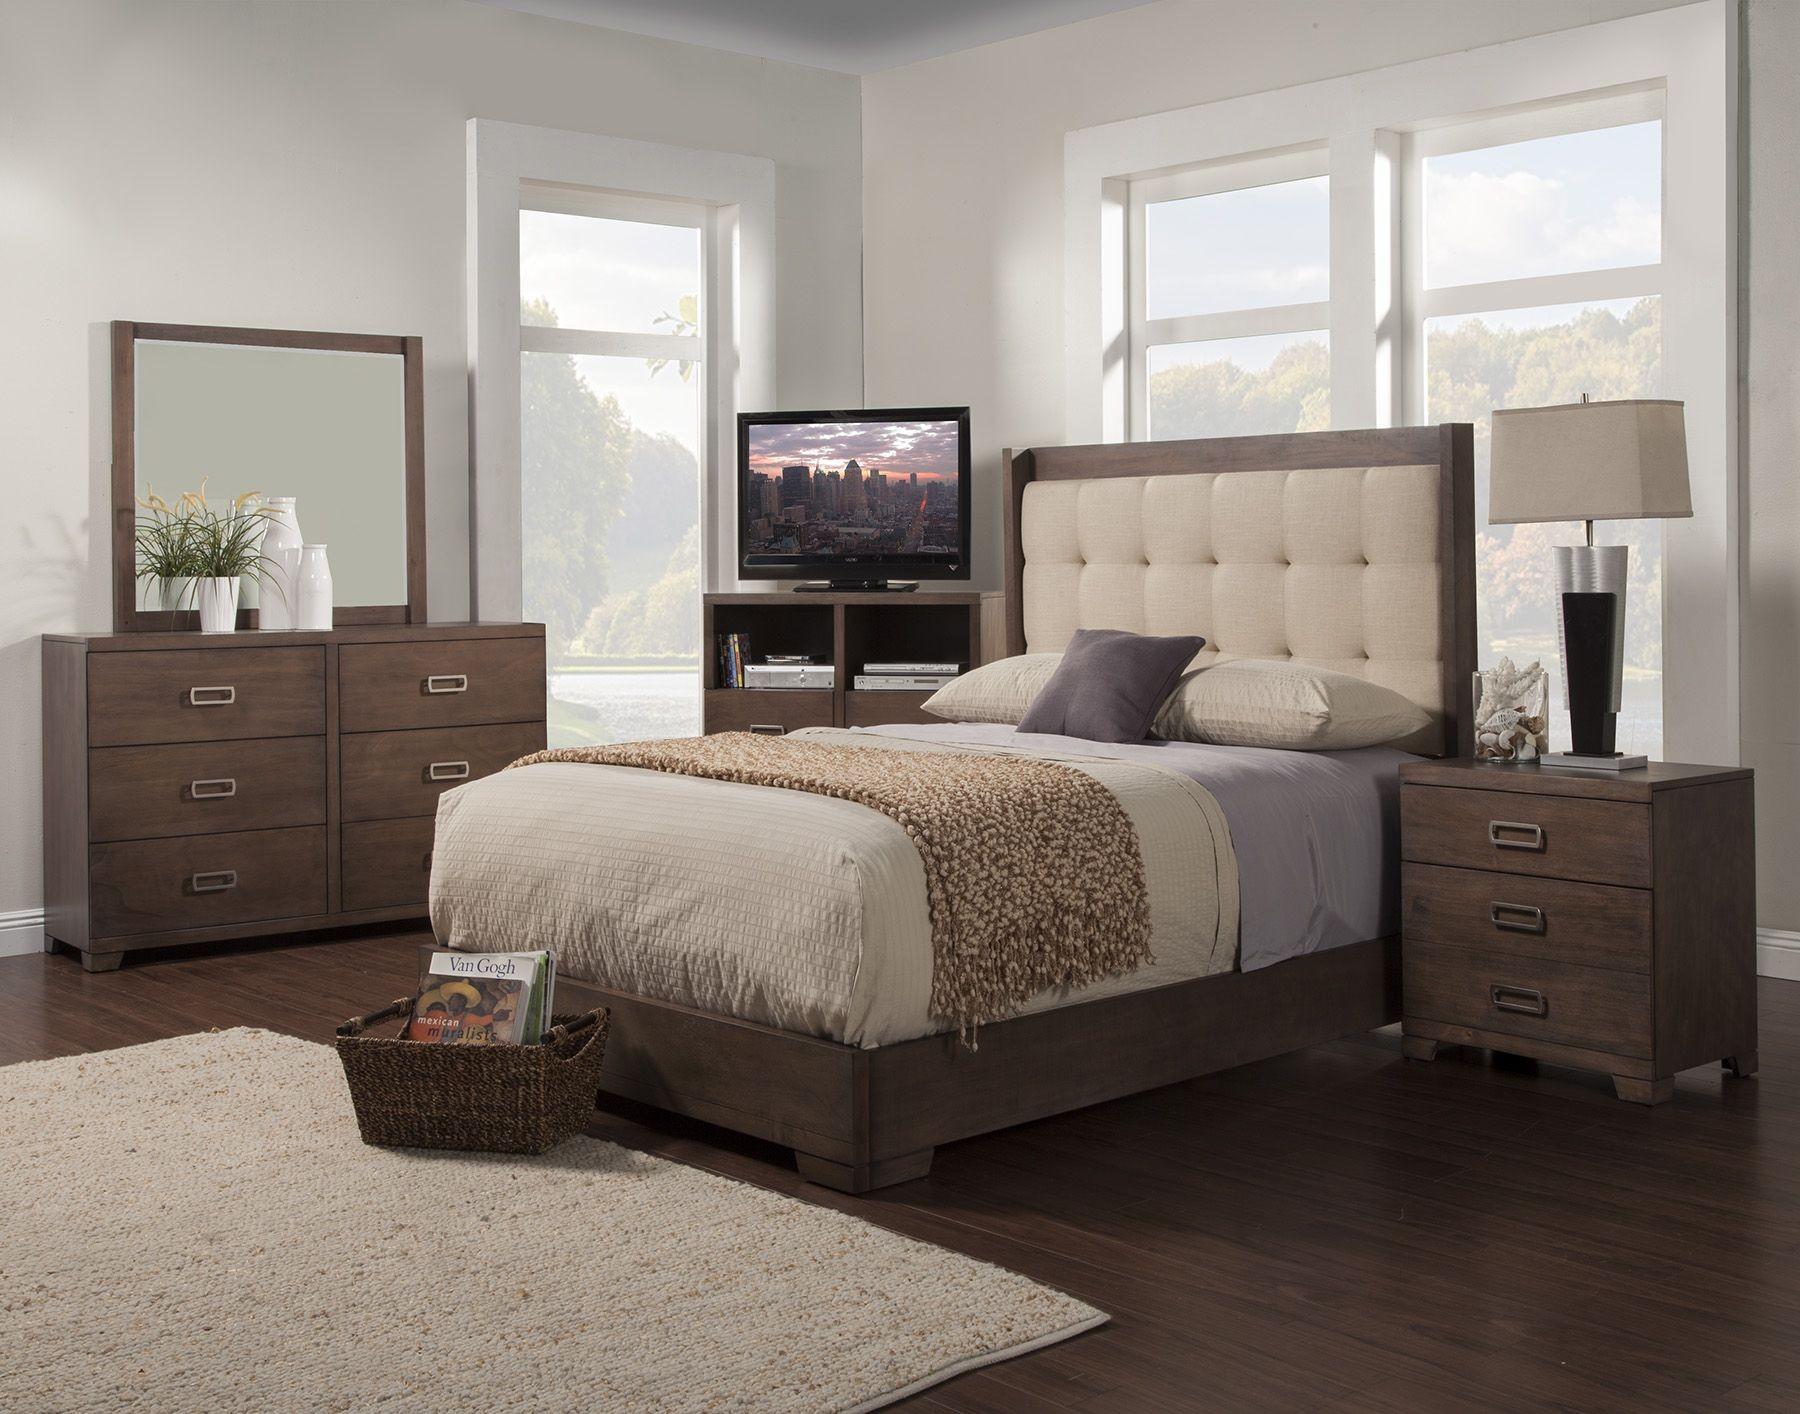 savannah pecan tufted platform bedroom set from alpine coleman furniture